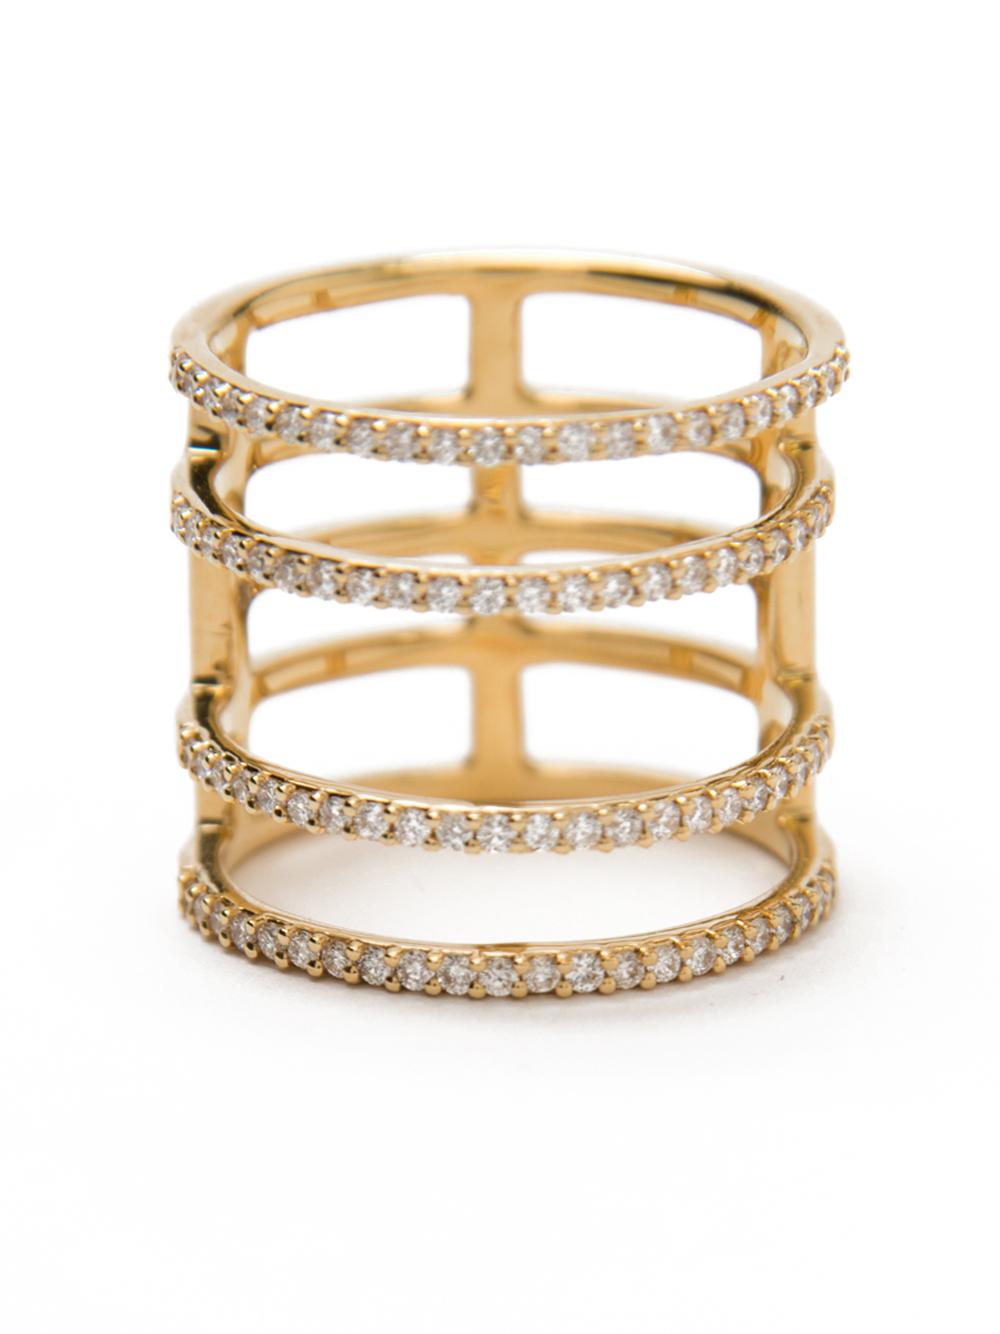 Khai Khai Woman 18-karat Gold Diamond And Crystal Ring Gold Size 7 Khai Khai eo7ljwni